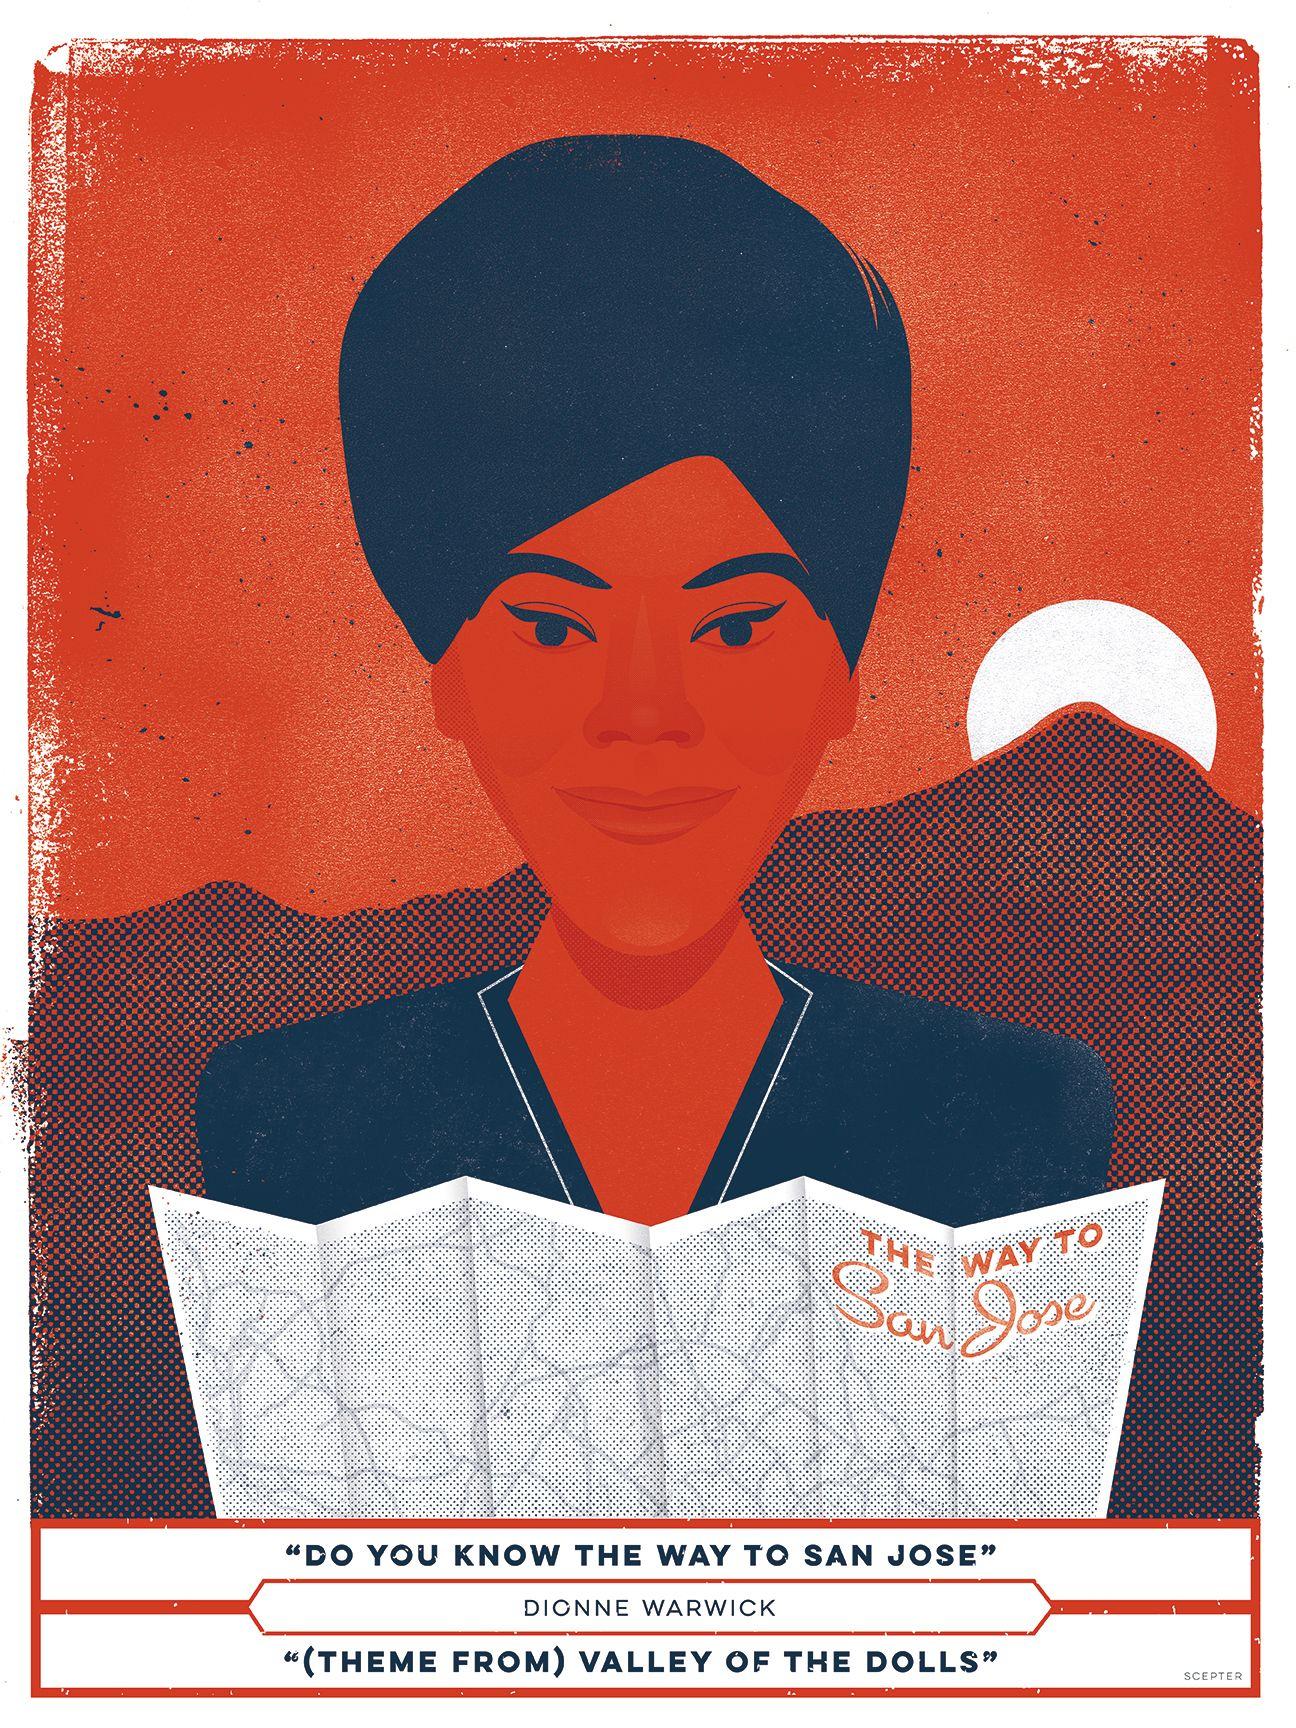 Dionne warwick do you know the way to san jose poster by jd dionne warwick do you know the way to san jose poster by jd humphreys hexwebz Choice Image